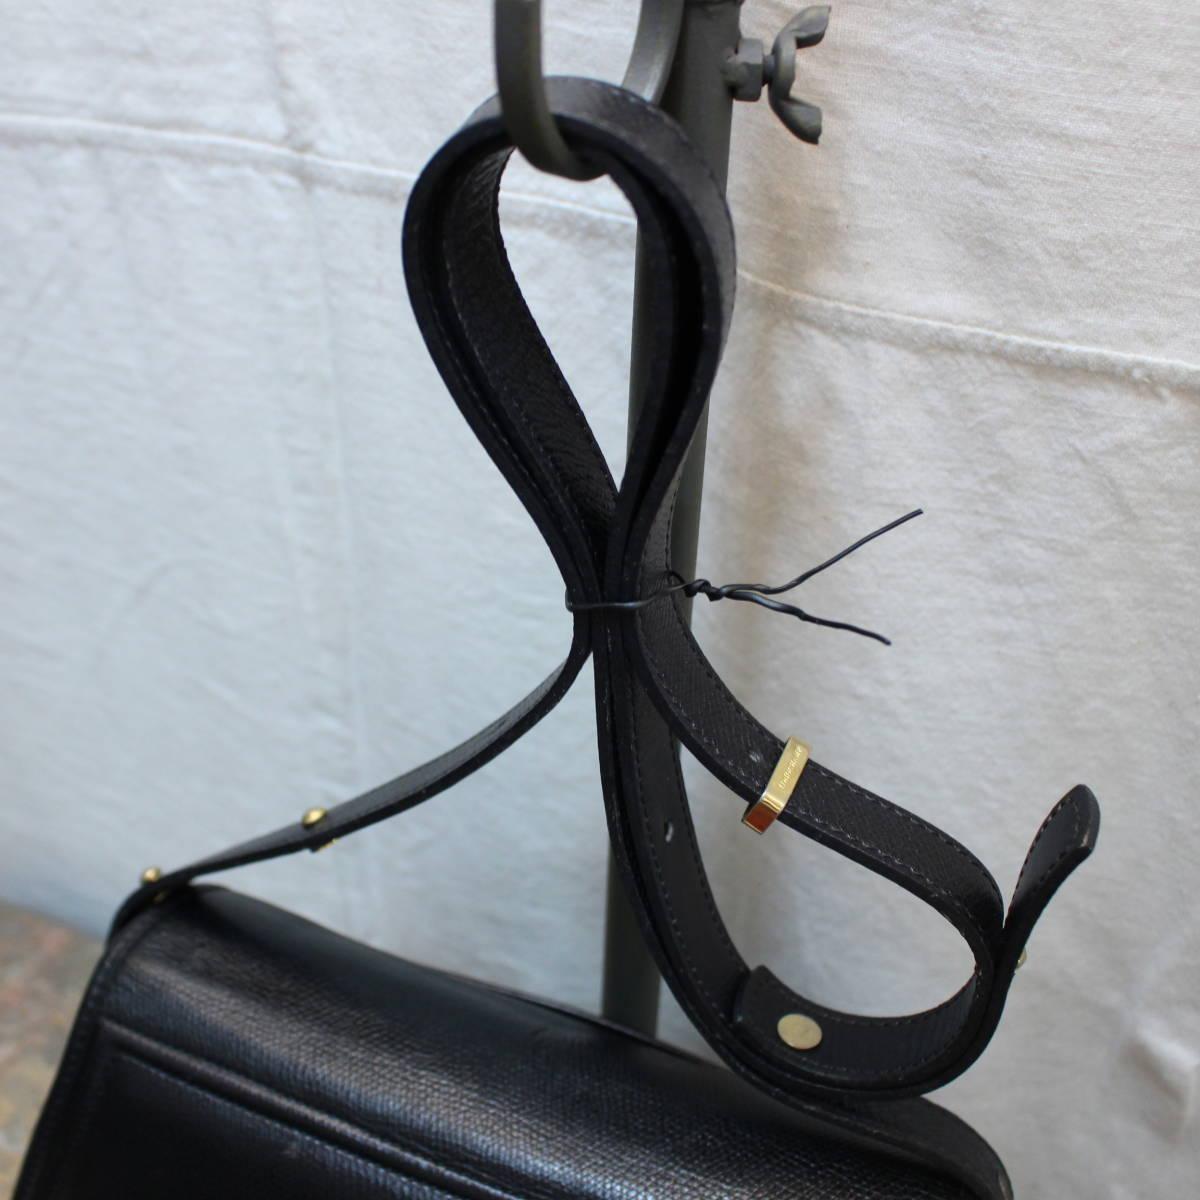 OLD LONGCHAMP LOGO LEATHER 2 WAY SHOULDER BAG MADE IN FRANCE/オールドロンシャン2wayロゴレザーショルダーバッグ_画像5